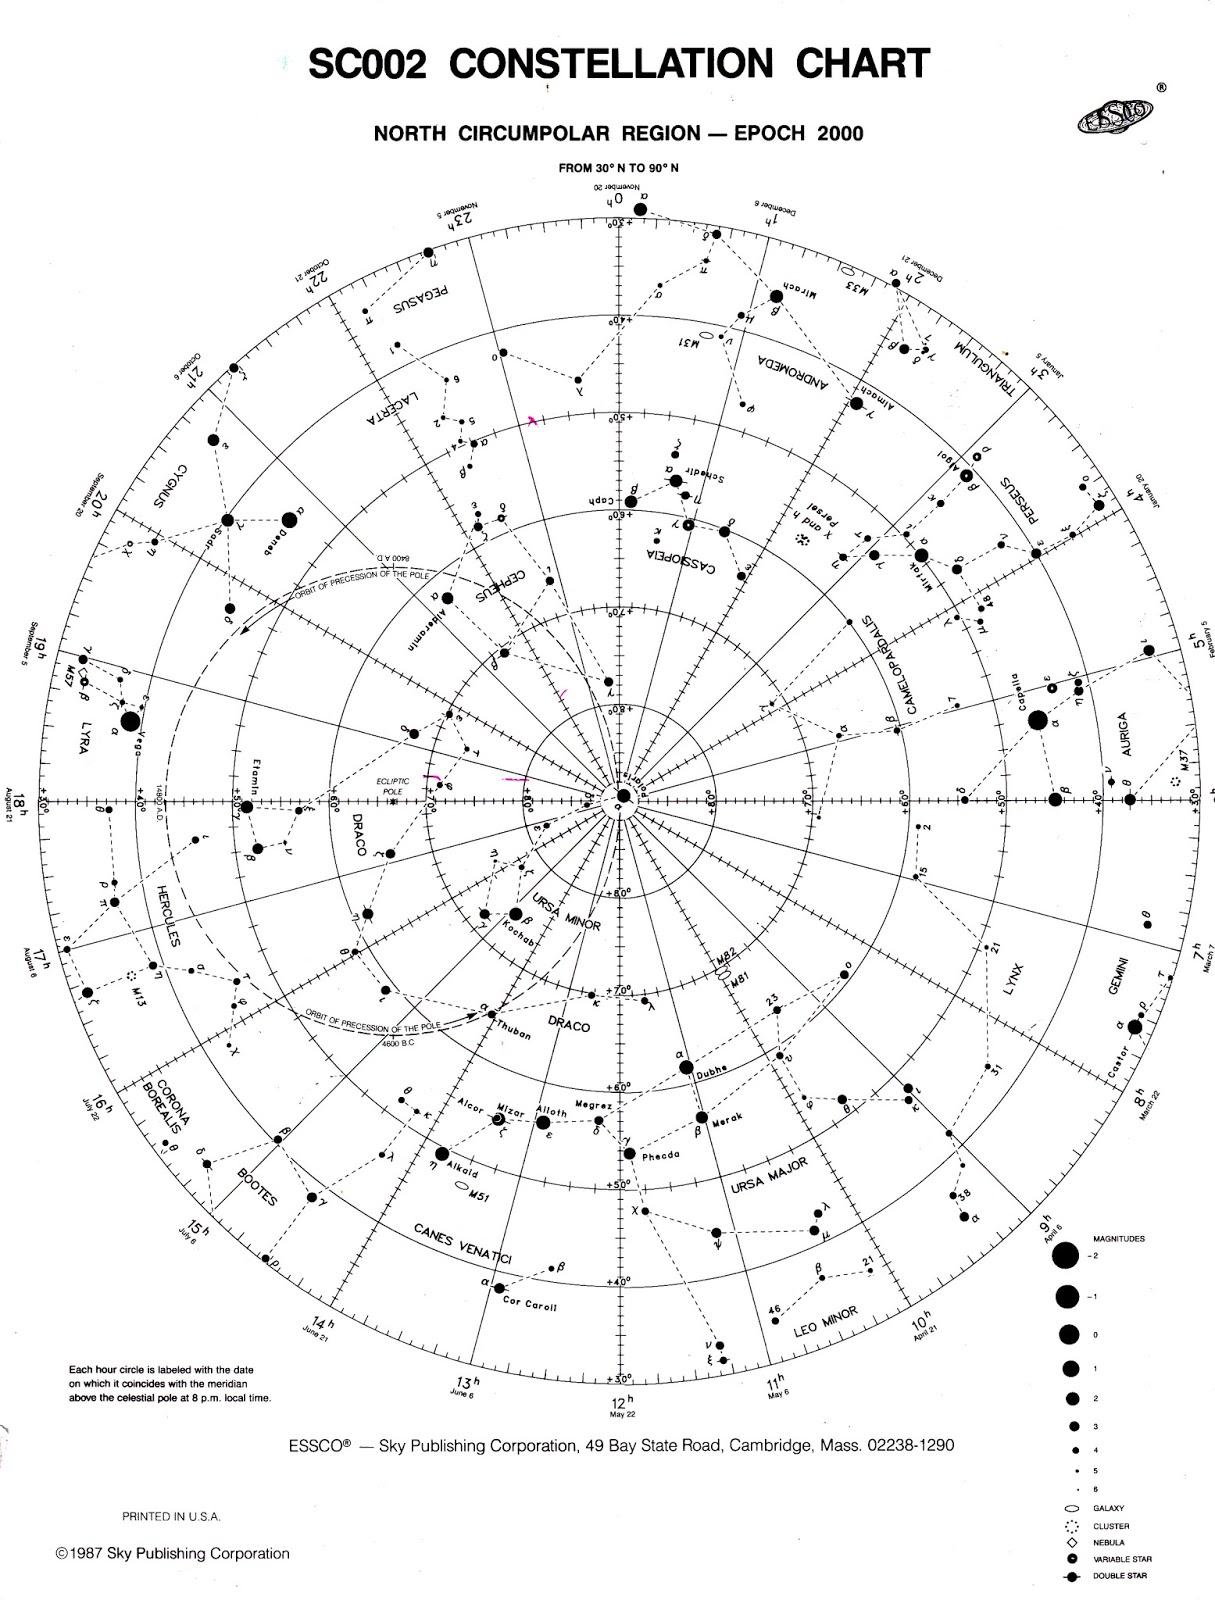 The Circumpolar Chart